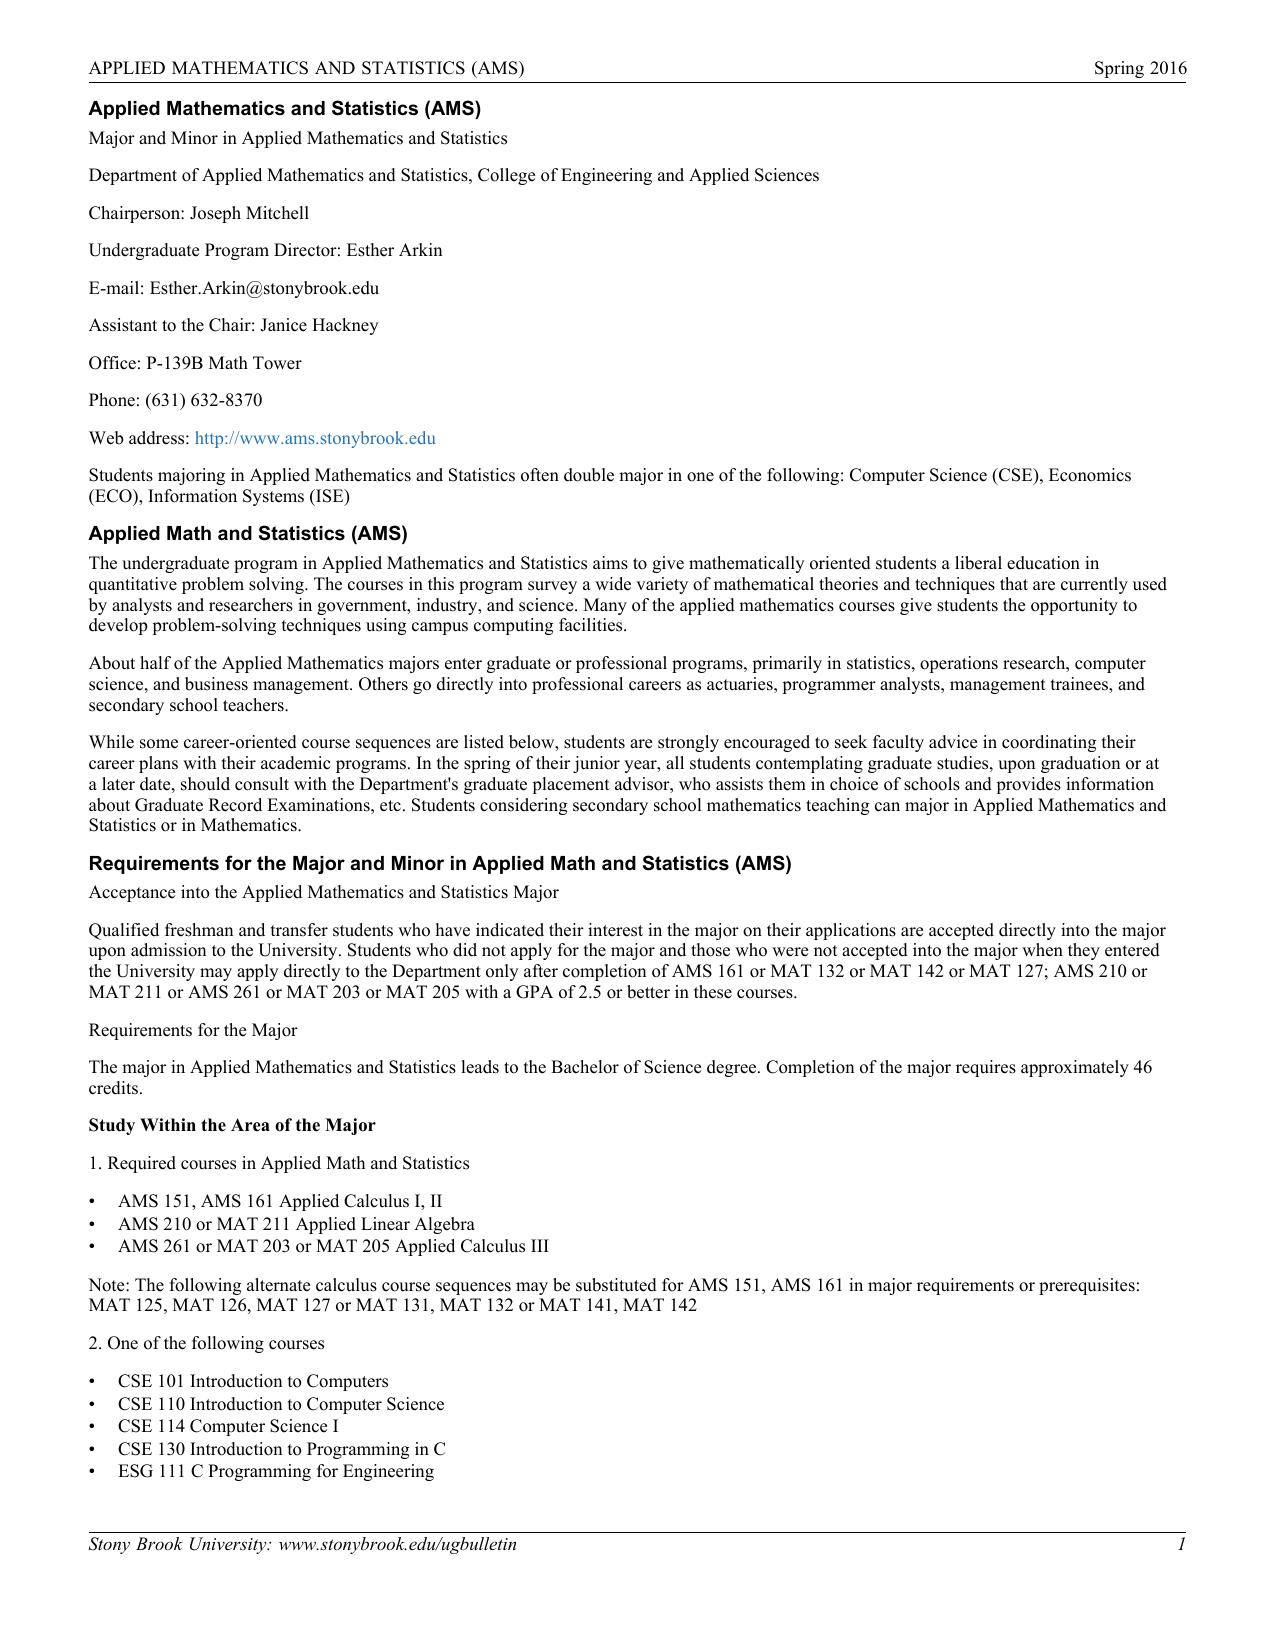 Program PDF - Stony Brook University